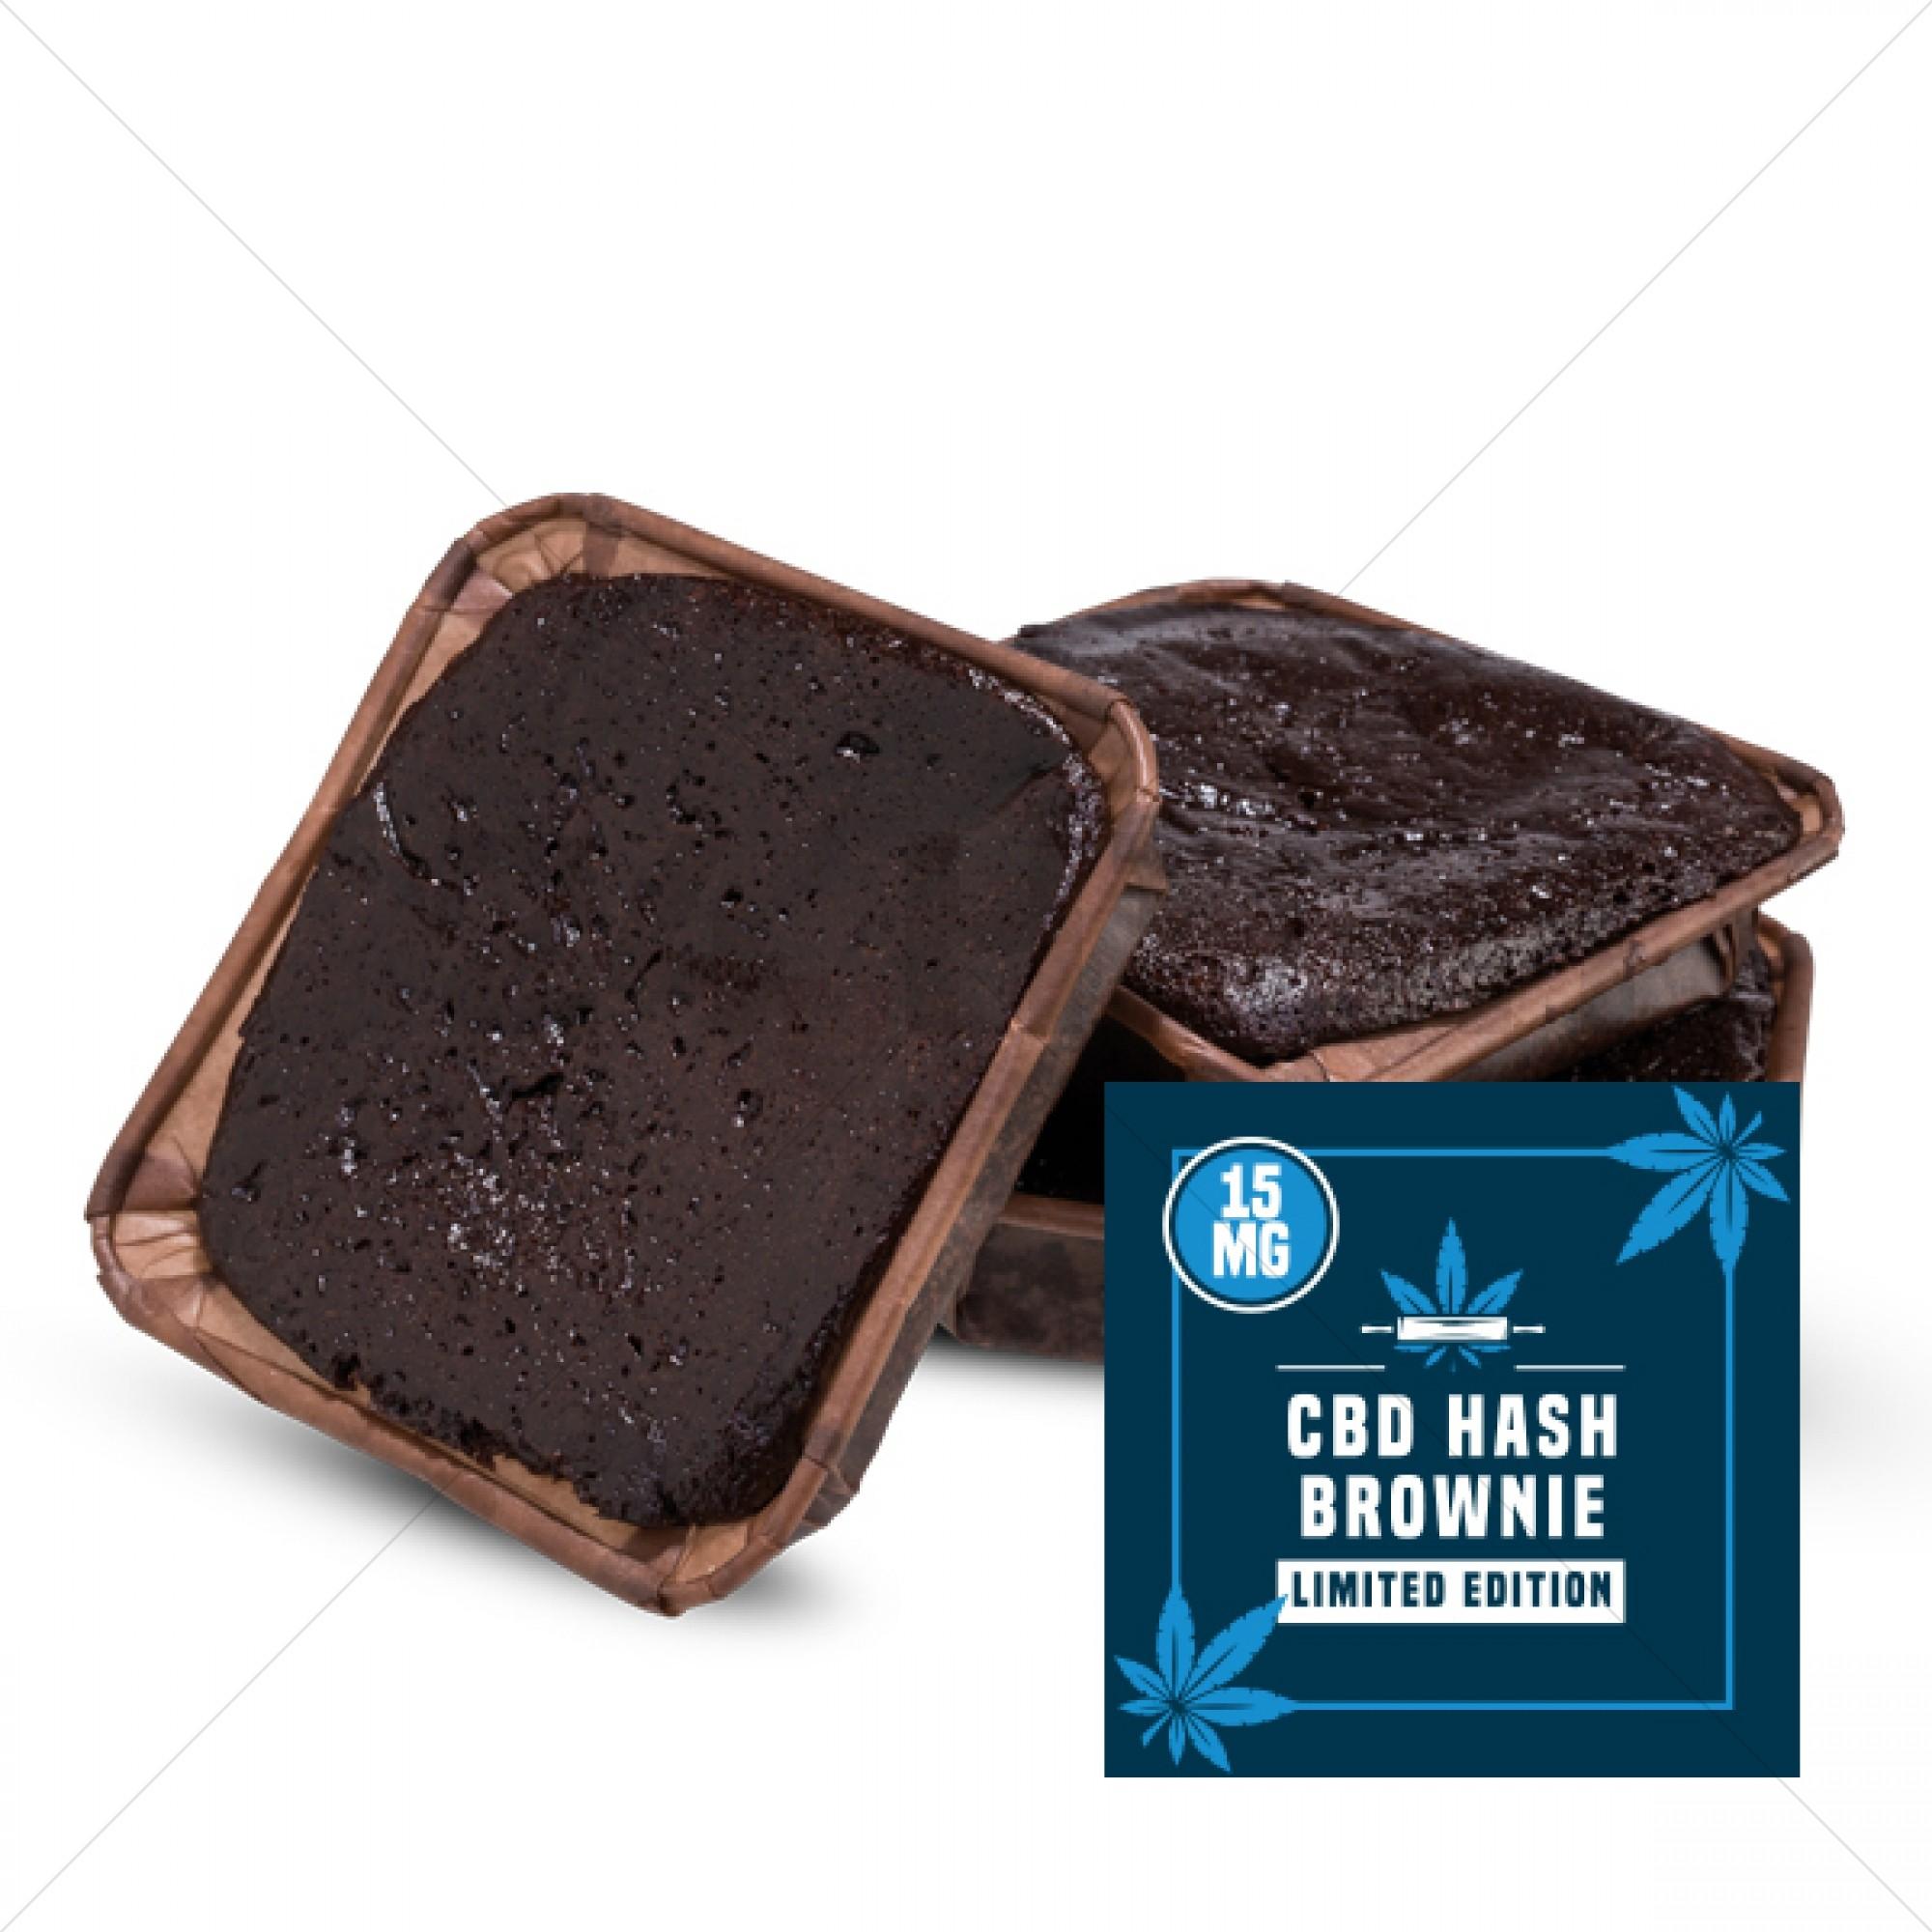 CBD Brownie - 15mg